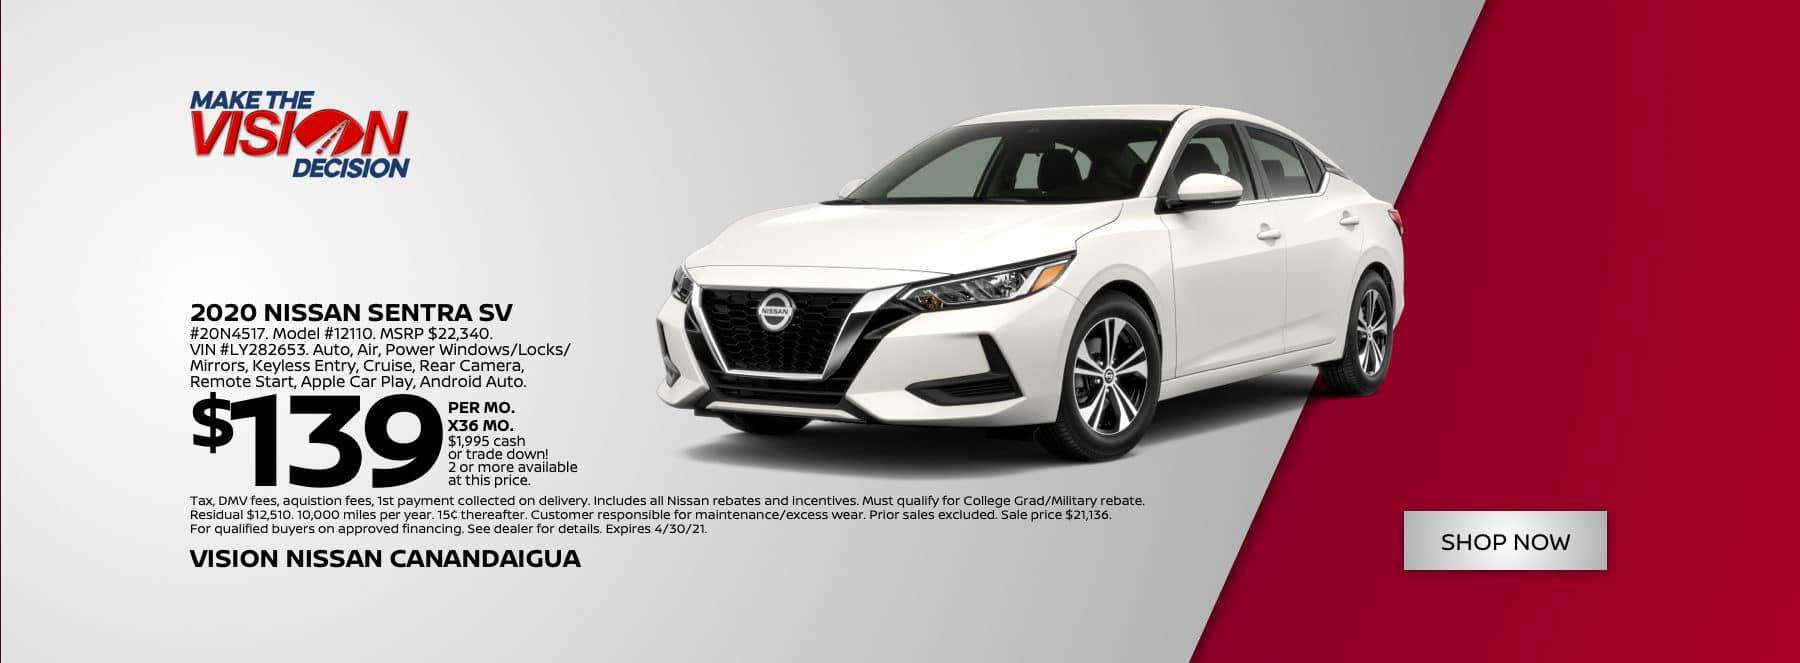 Vision-Nissan-Sliders-0305-Sentra-Can